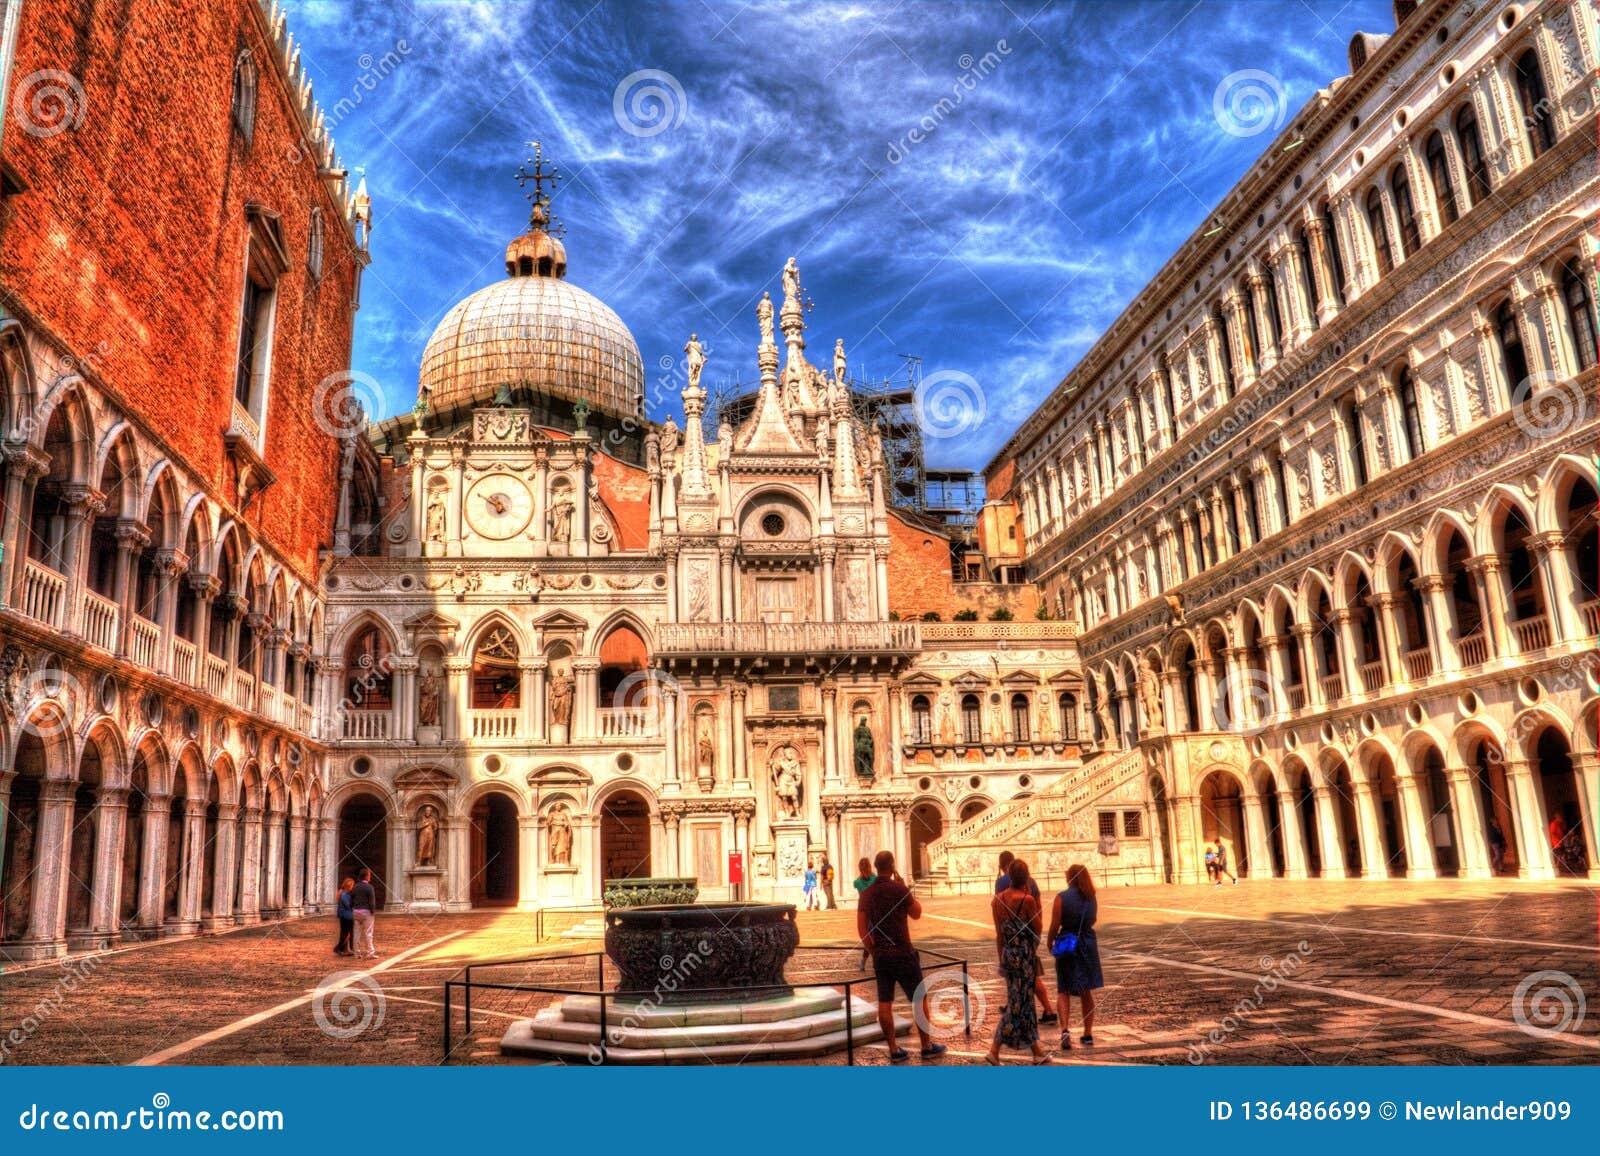 Ourtyard Palazzo Дукале ¡ Ð, Венеция, Италия